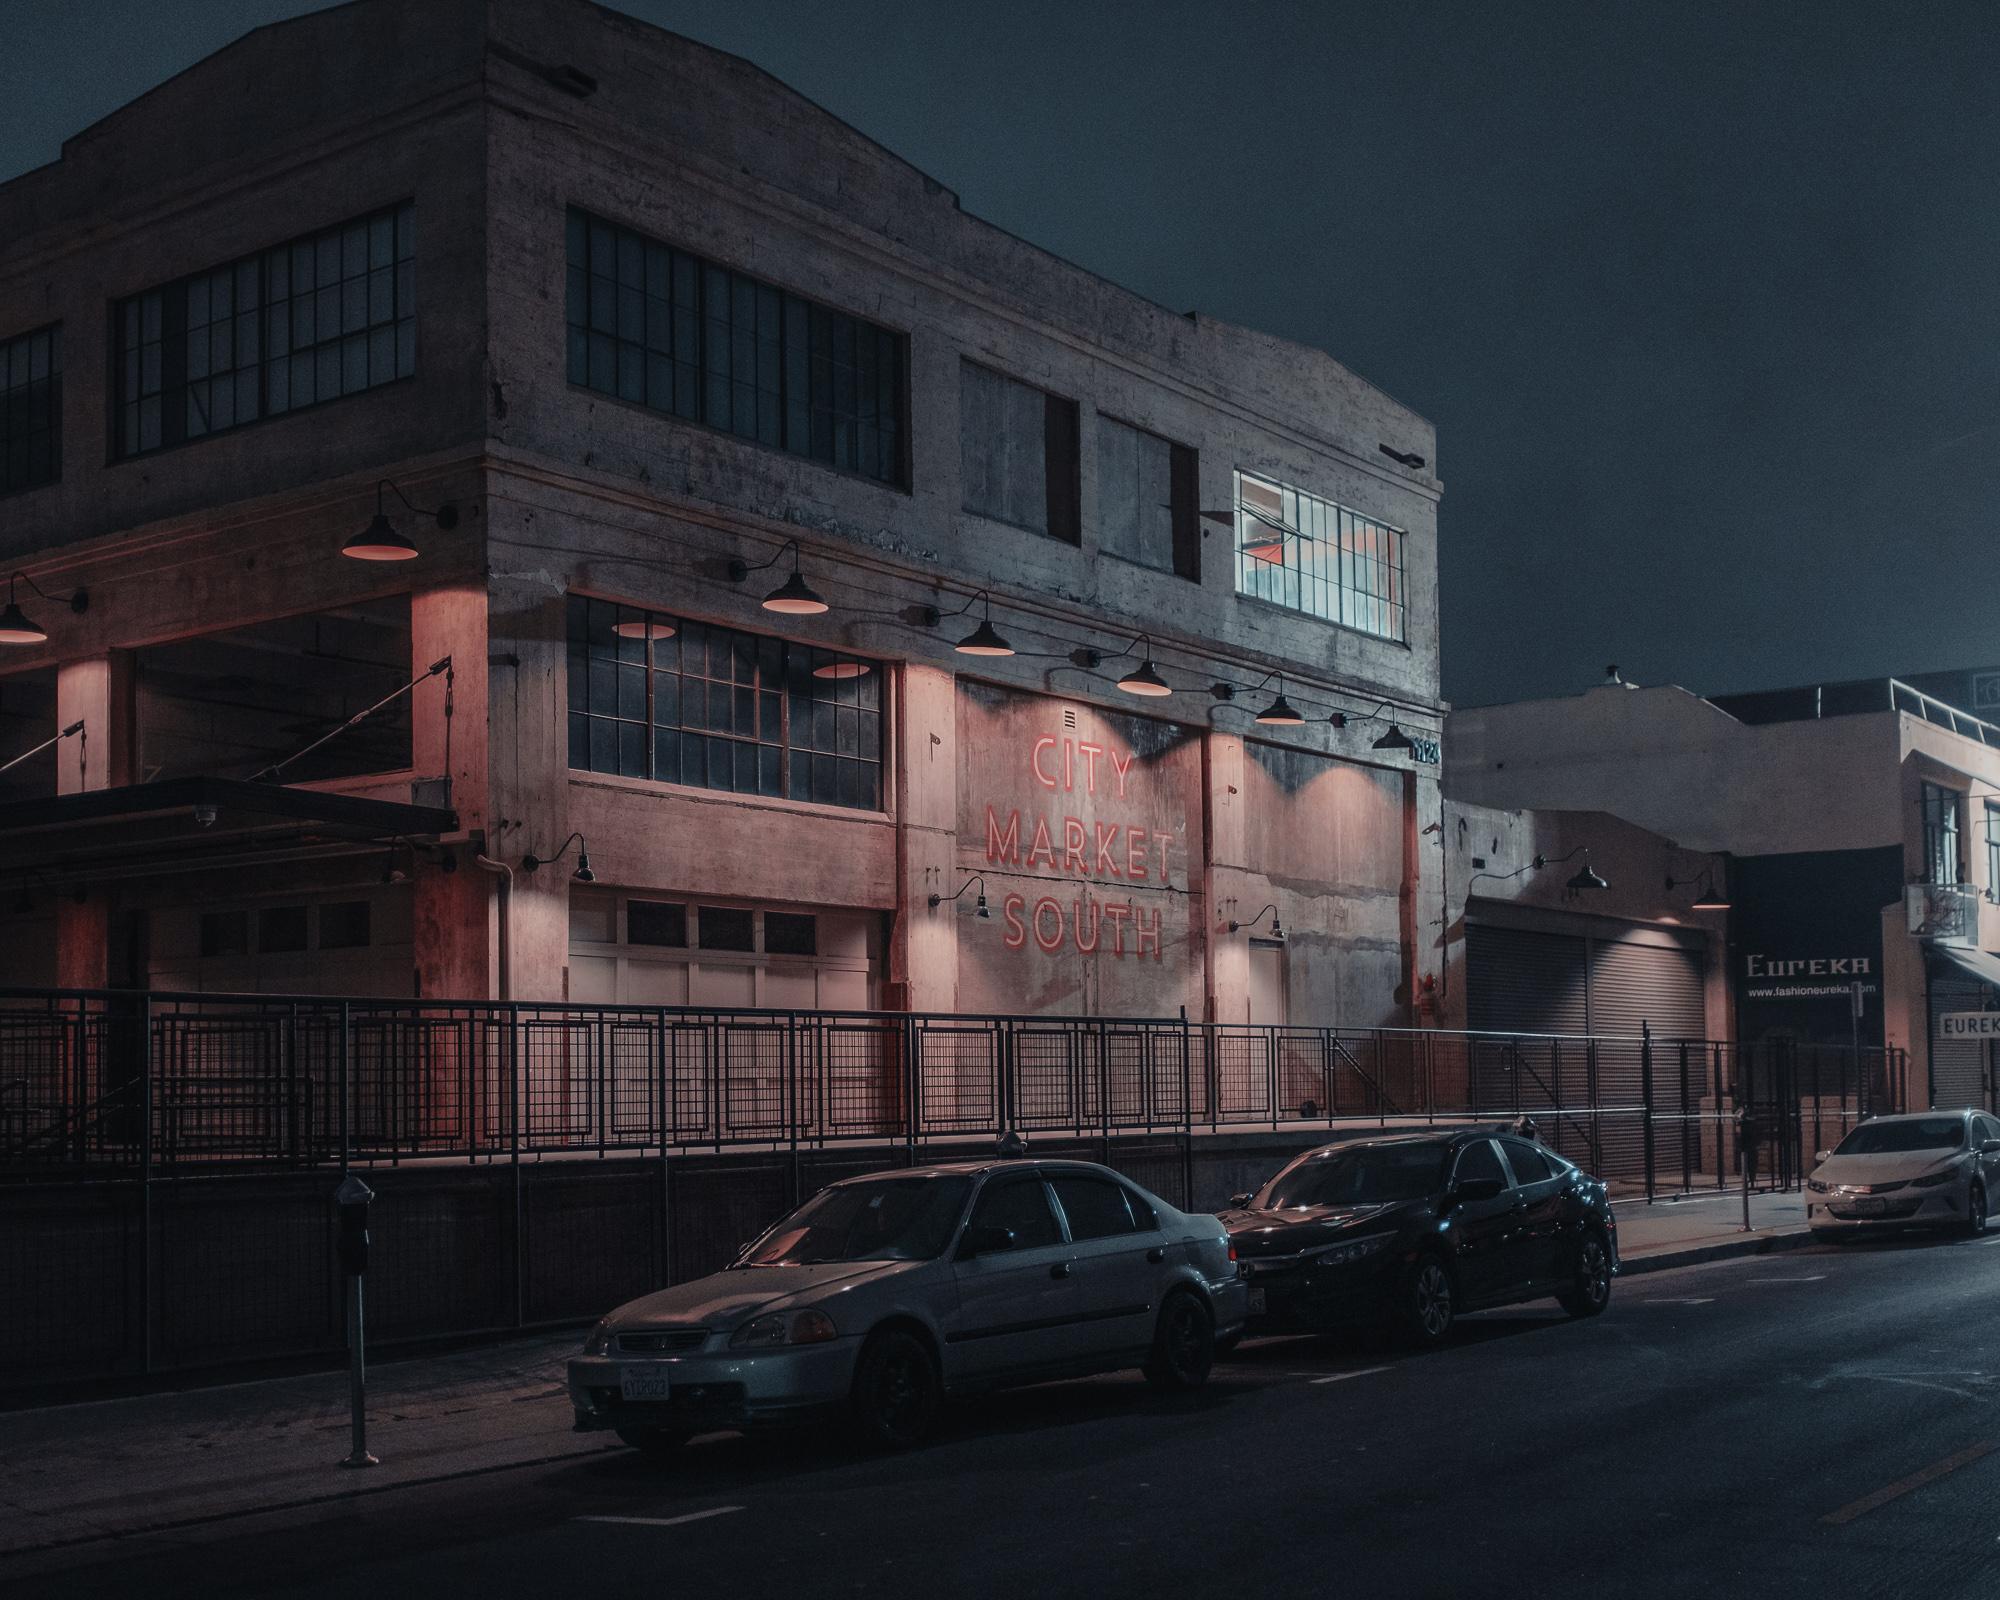 Nights-12.jpg